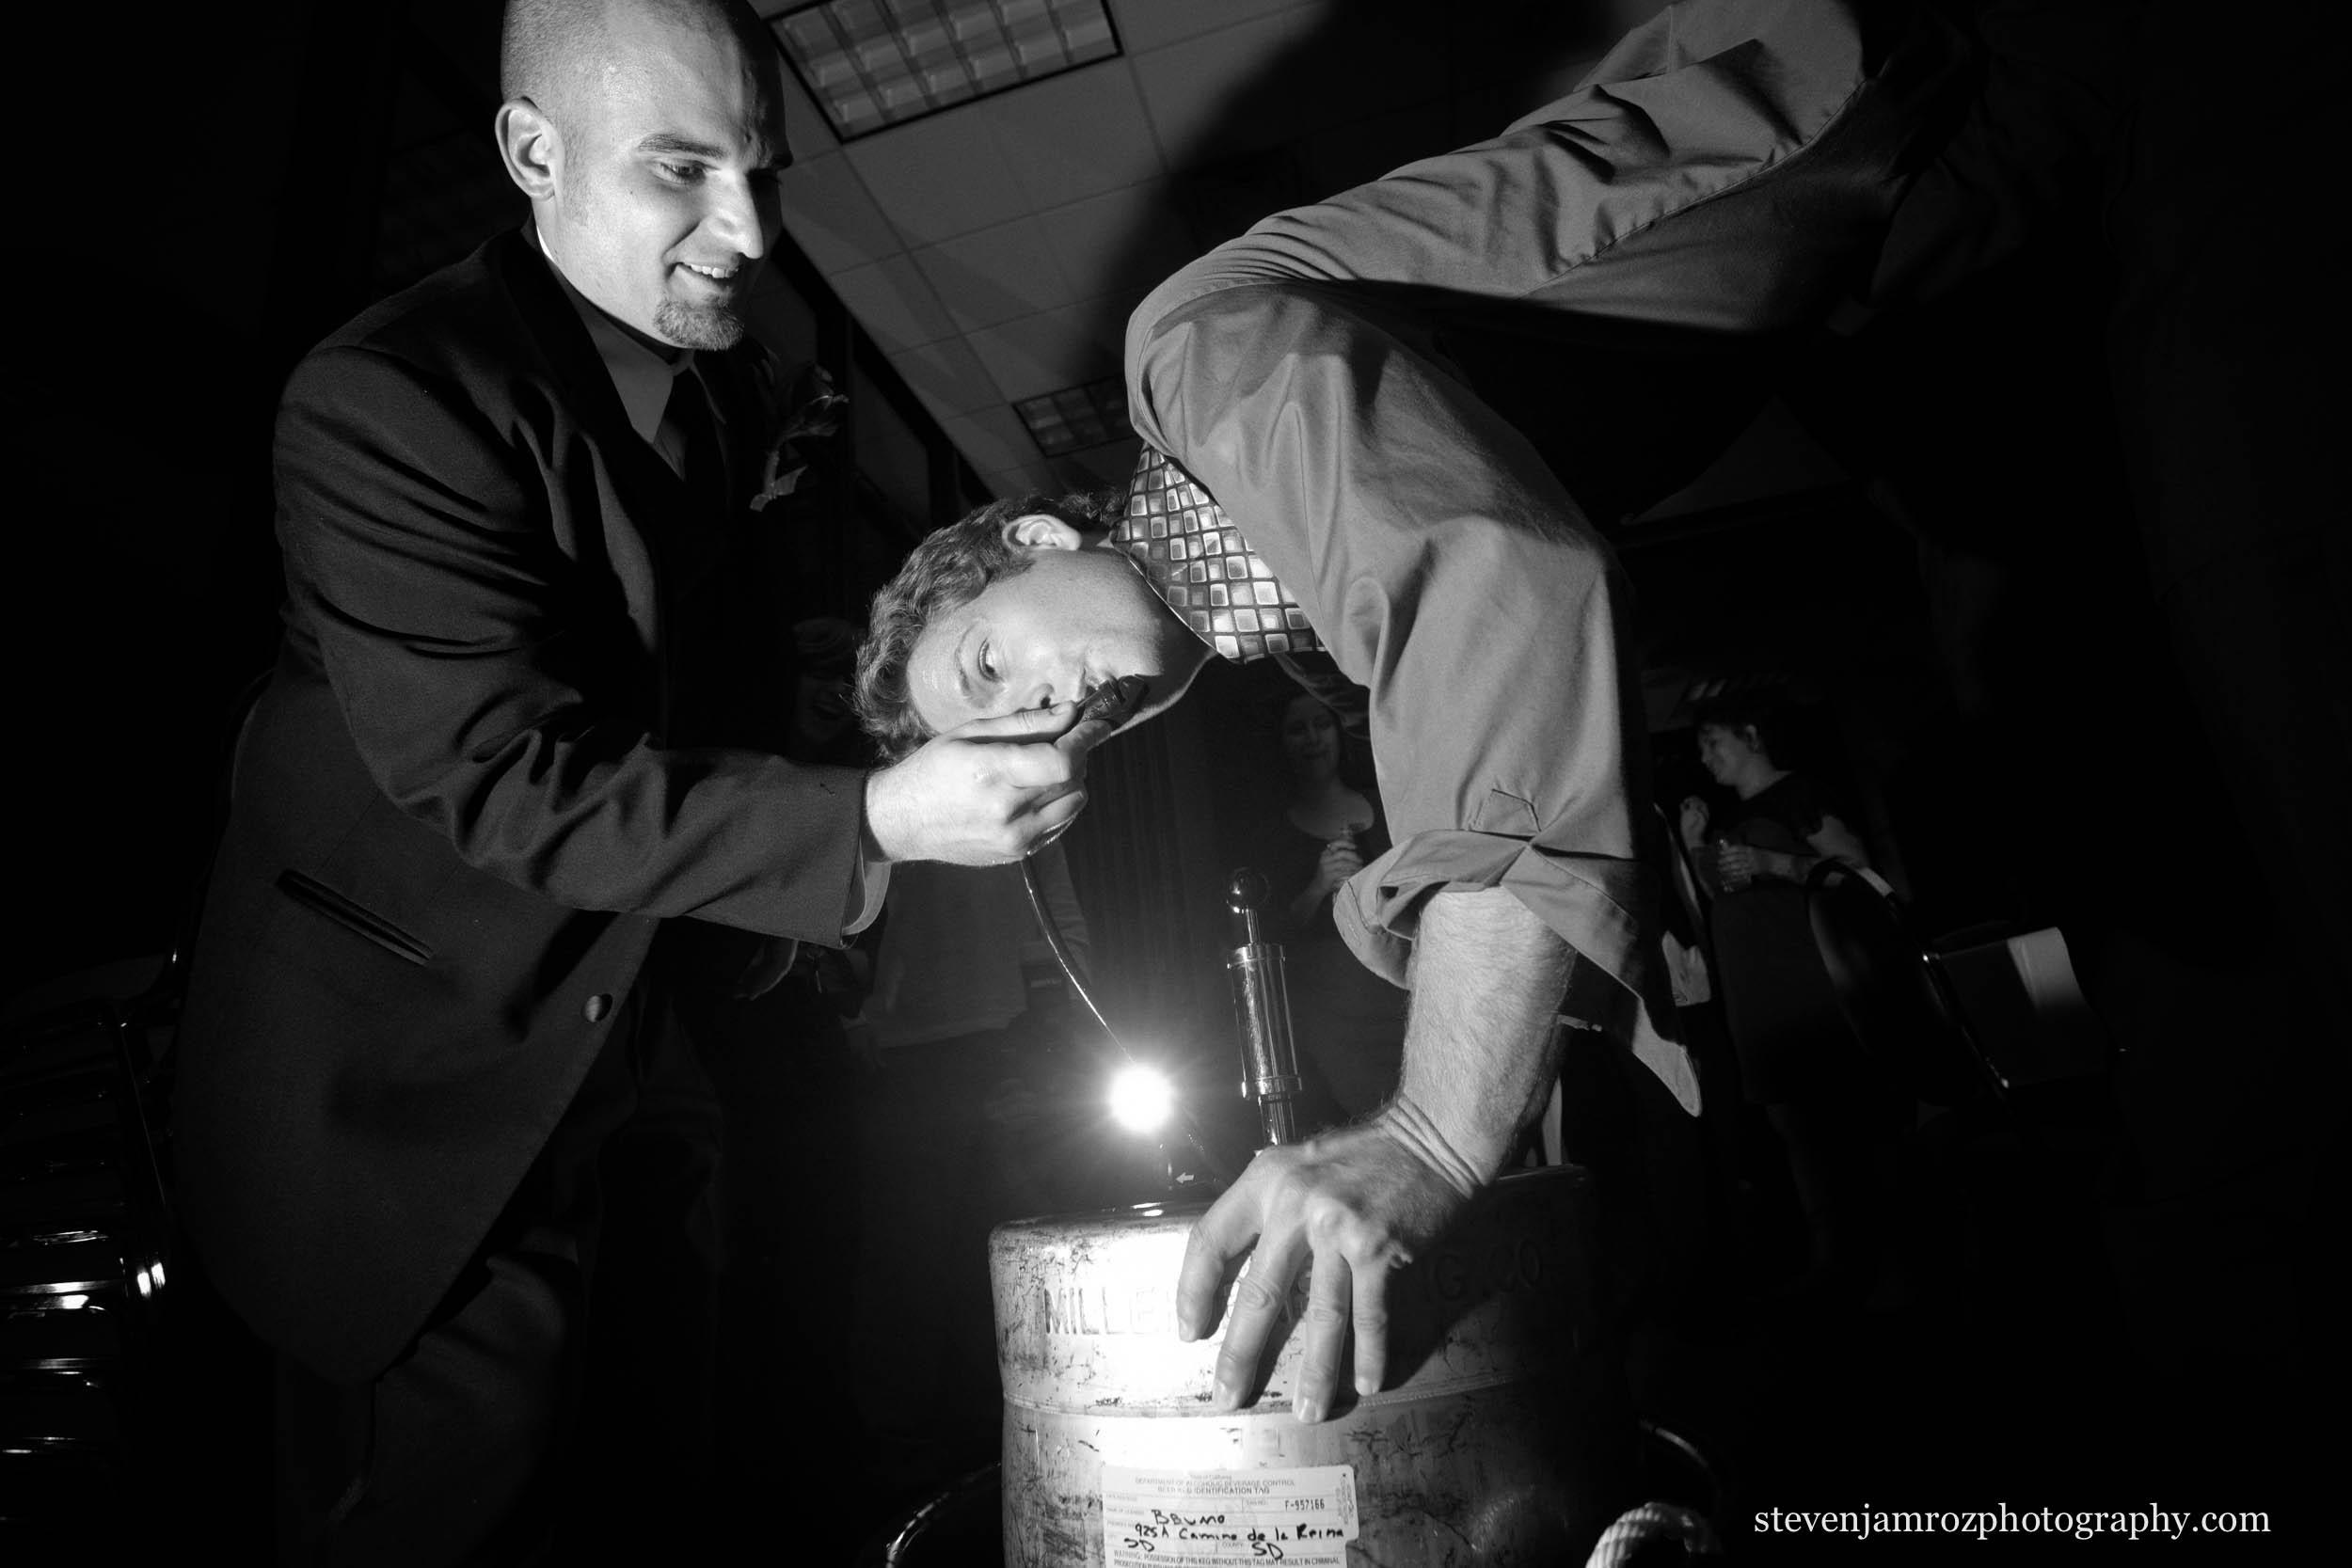 keg-stand-beer-raleigh-wedding-groomsman-photographer-0762.jpg